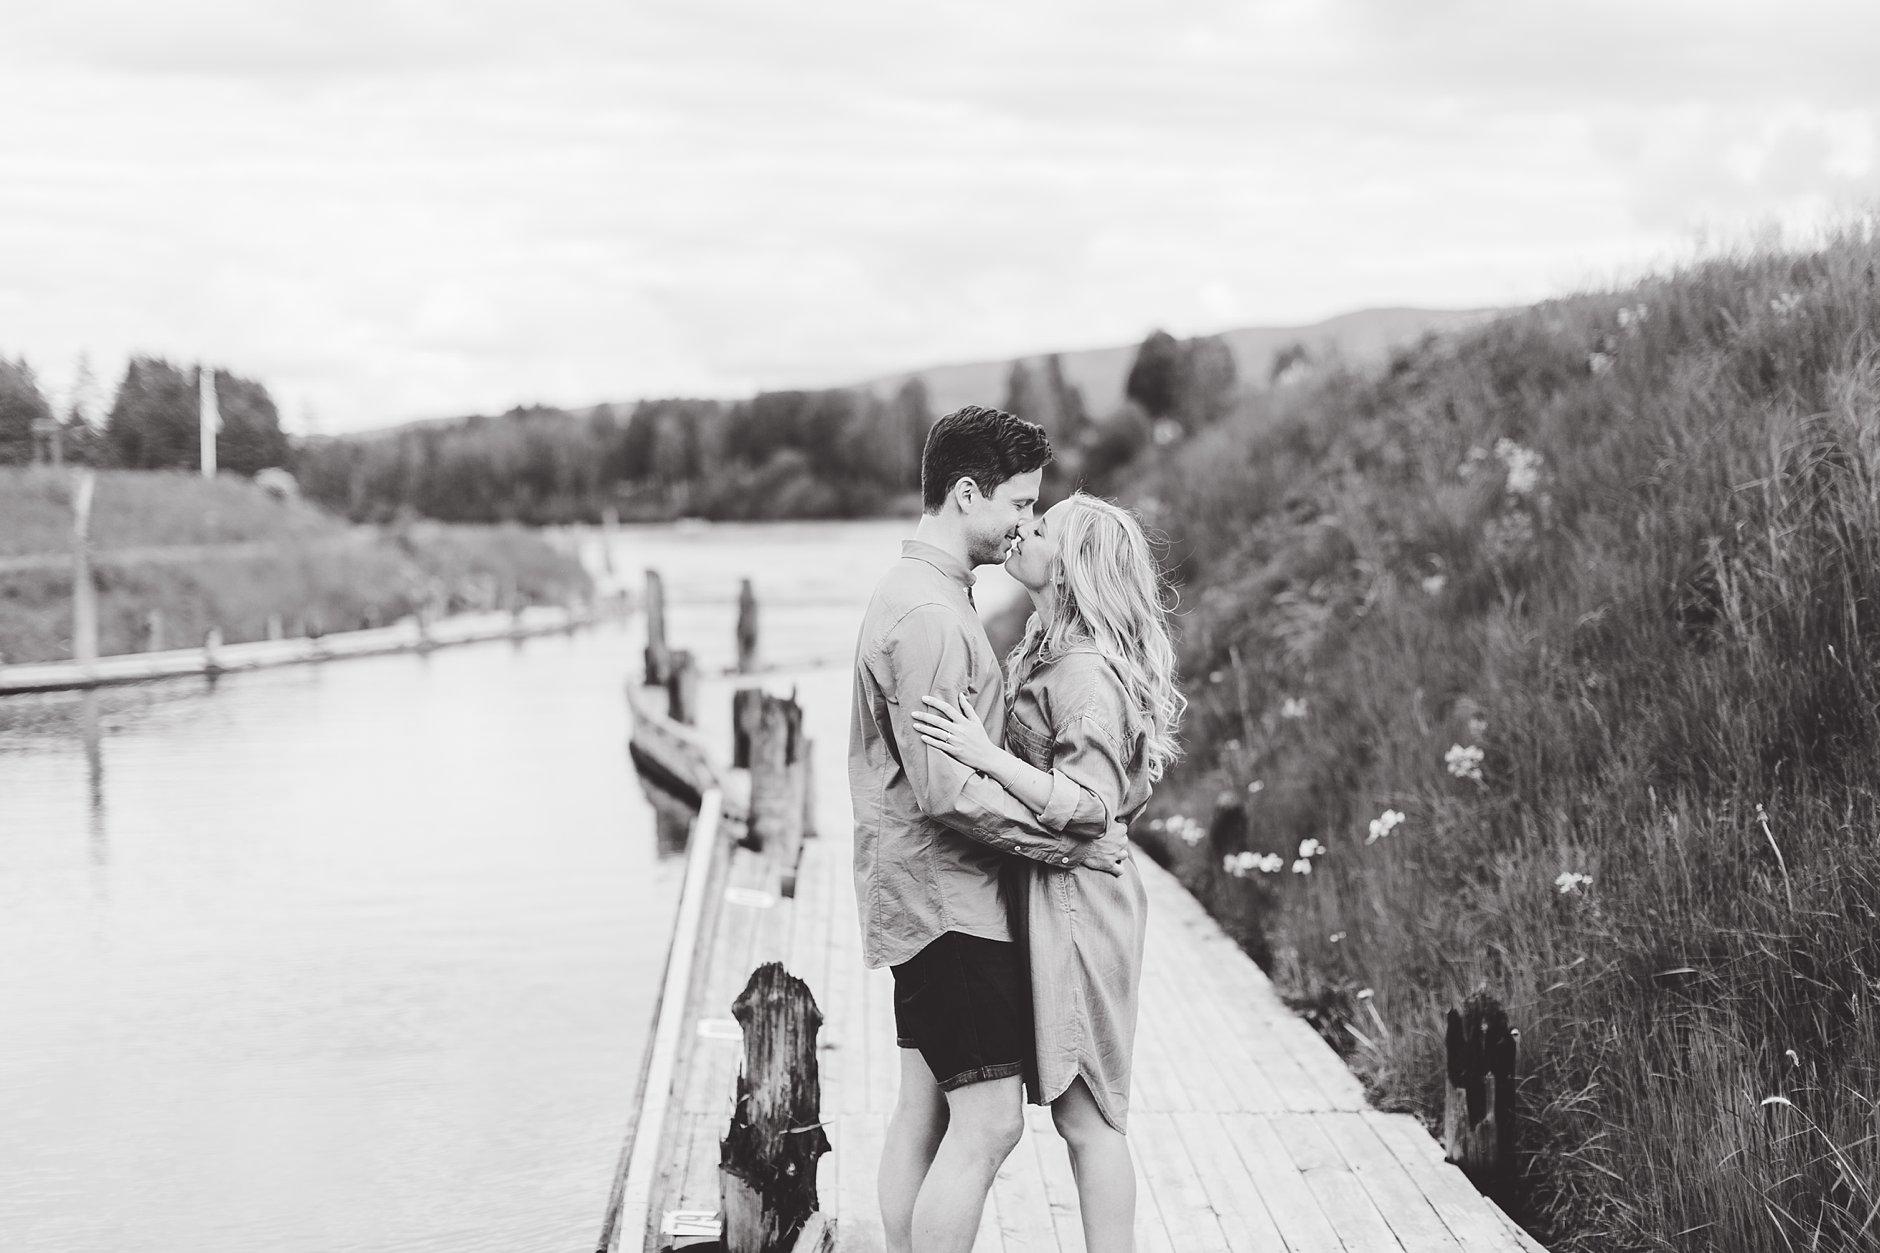 Kjærestebilder på brygga